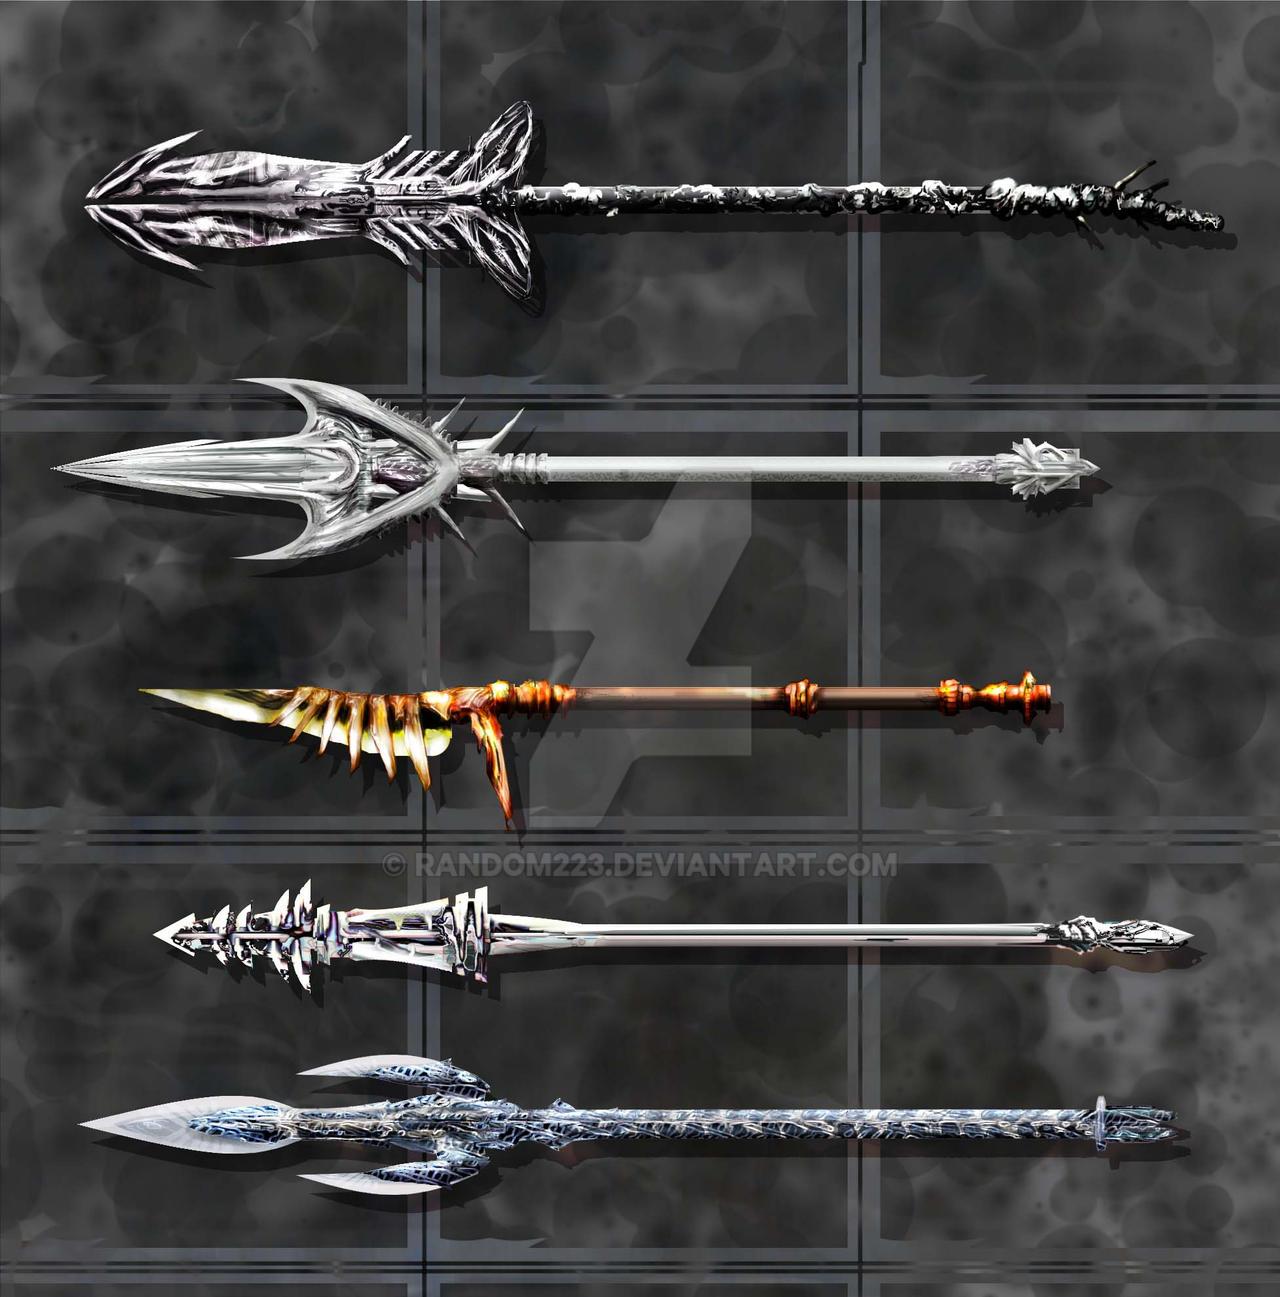 Weaponry 213 by Random223